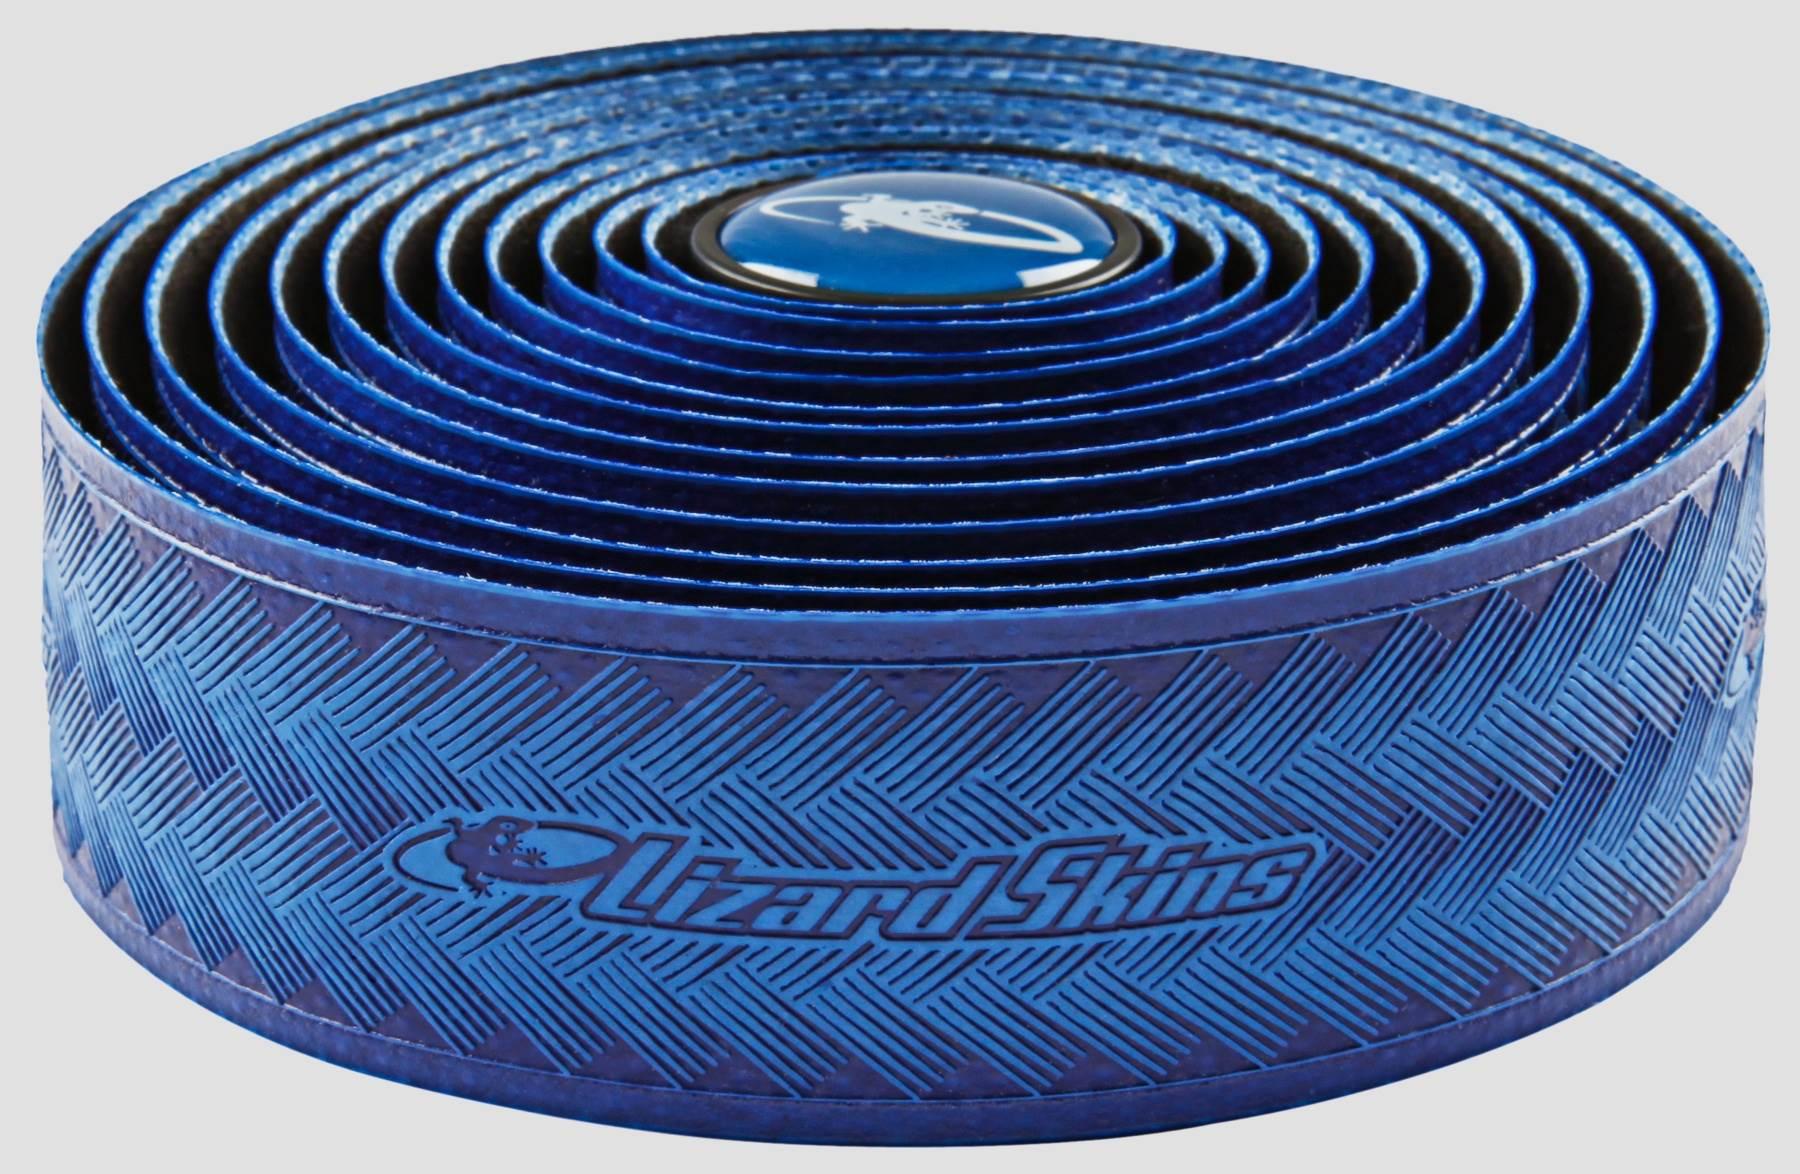 FITA DE GUIDÃO LIZARD SKINS DSPDST40 - BLUE 3.2MM